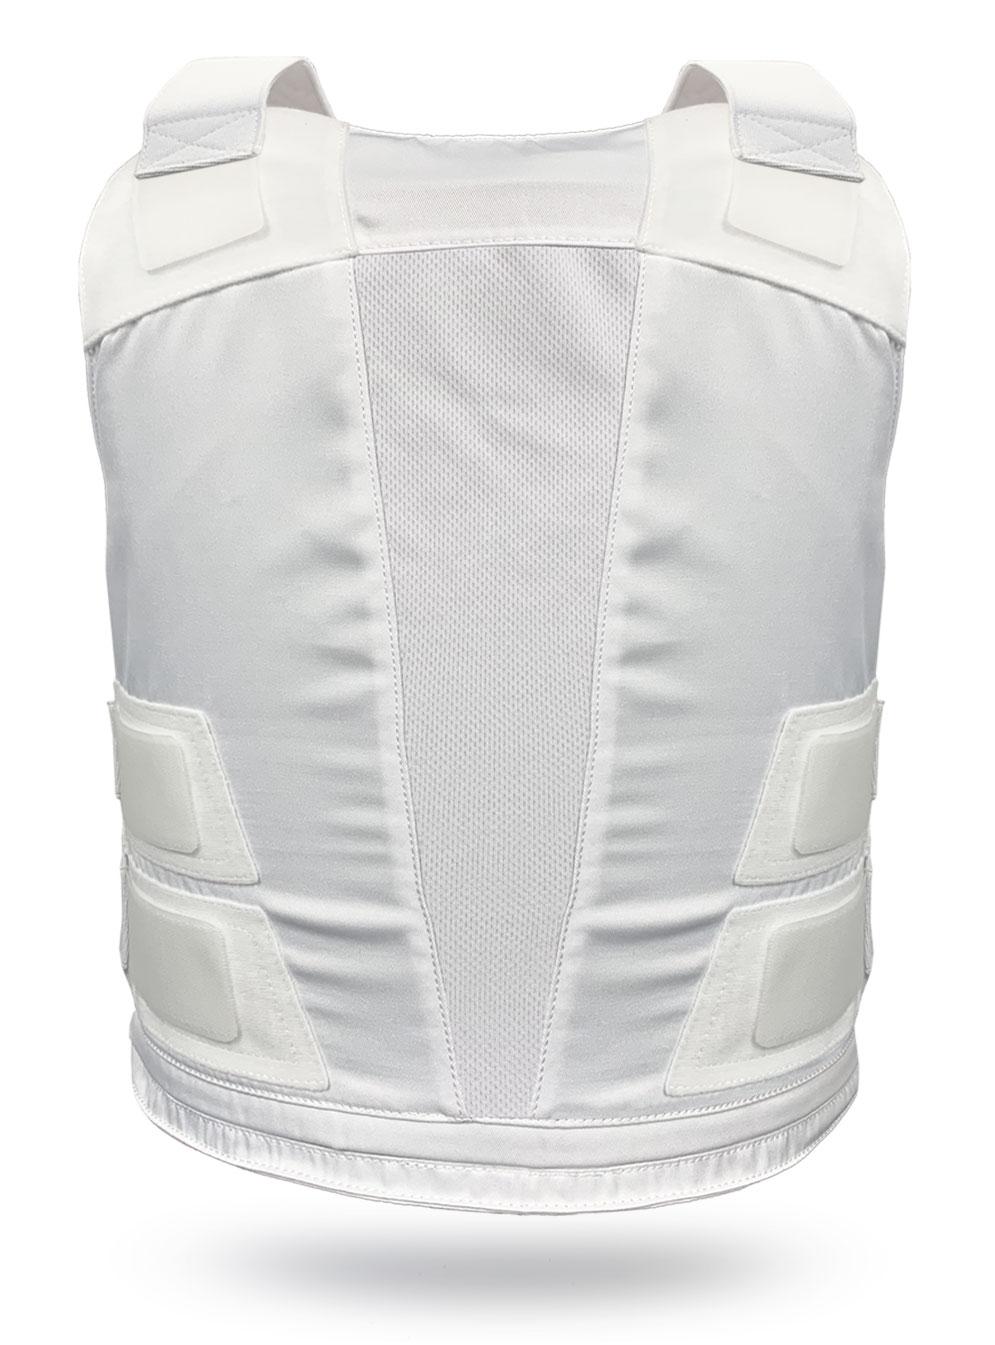 Ultra Covert Body Armour NIJ Level IIIA